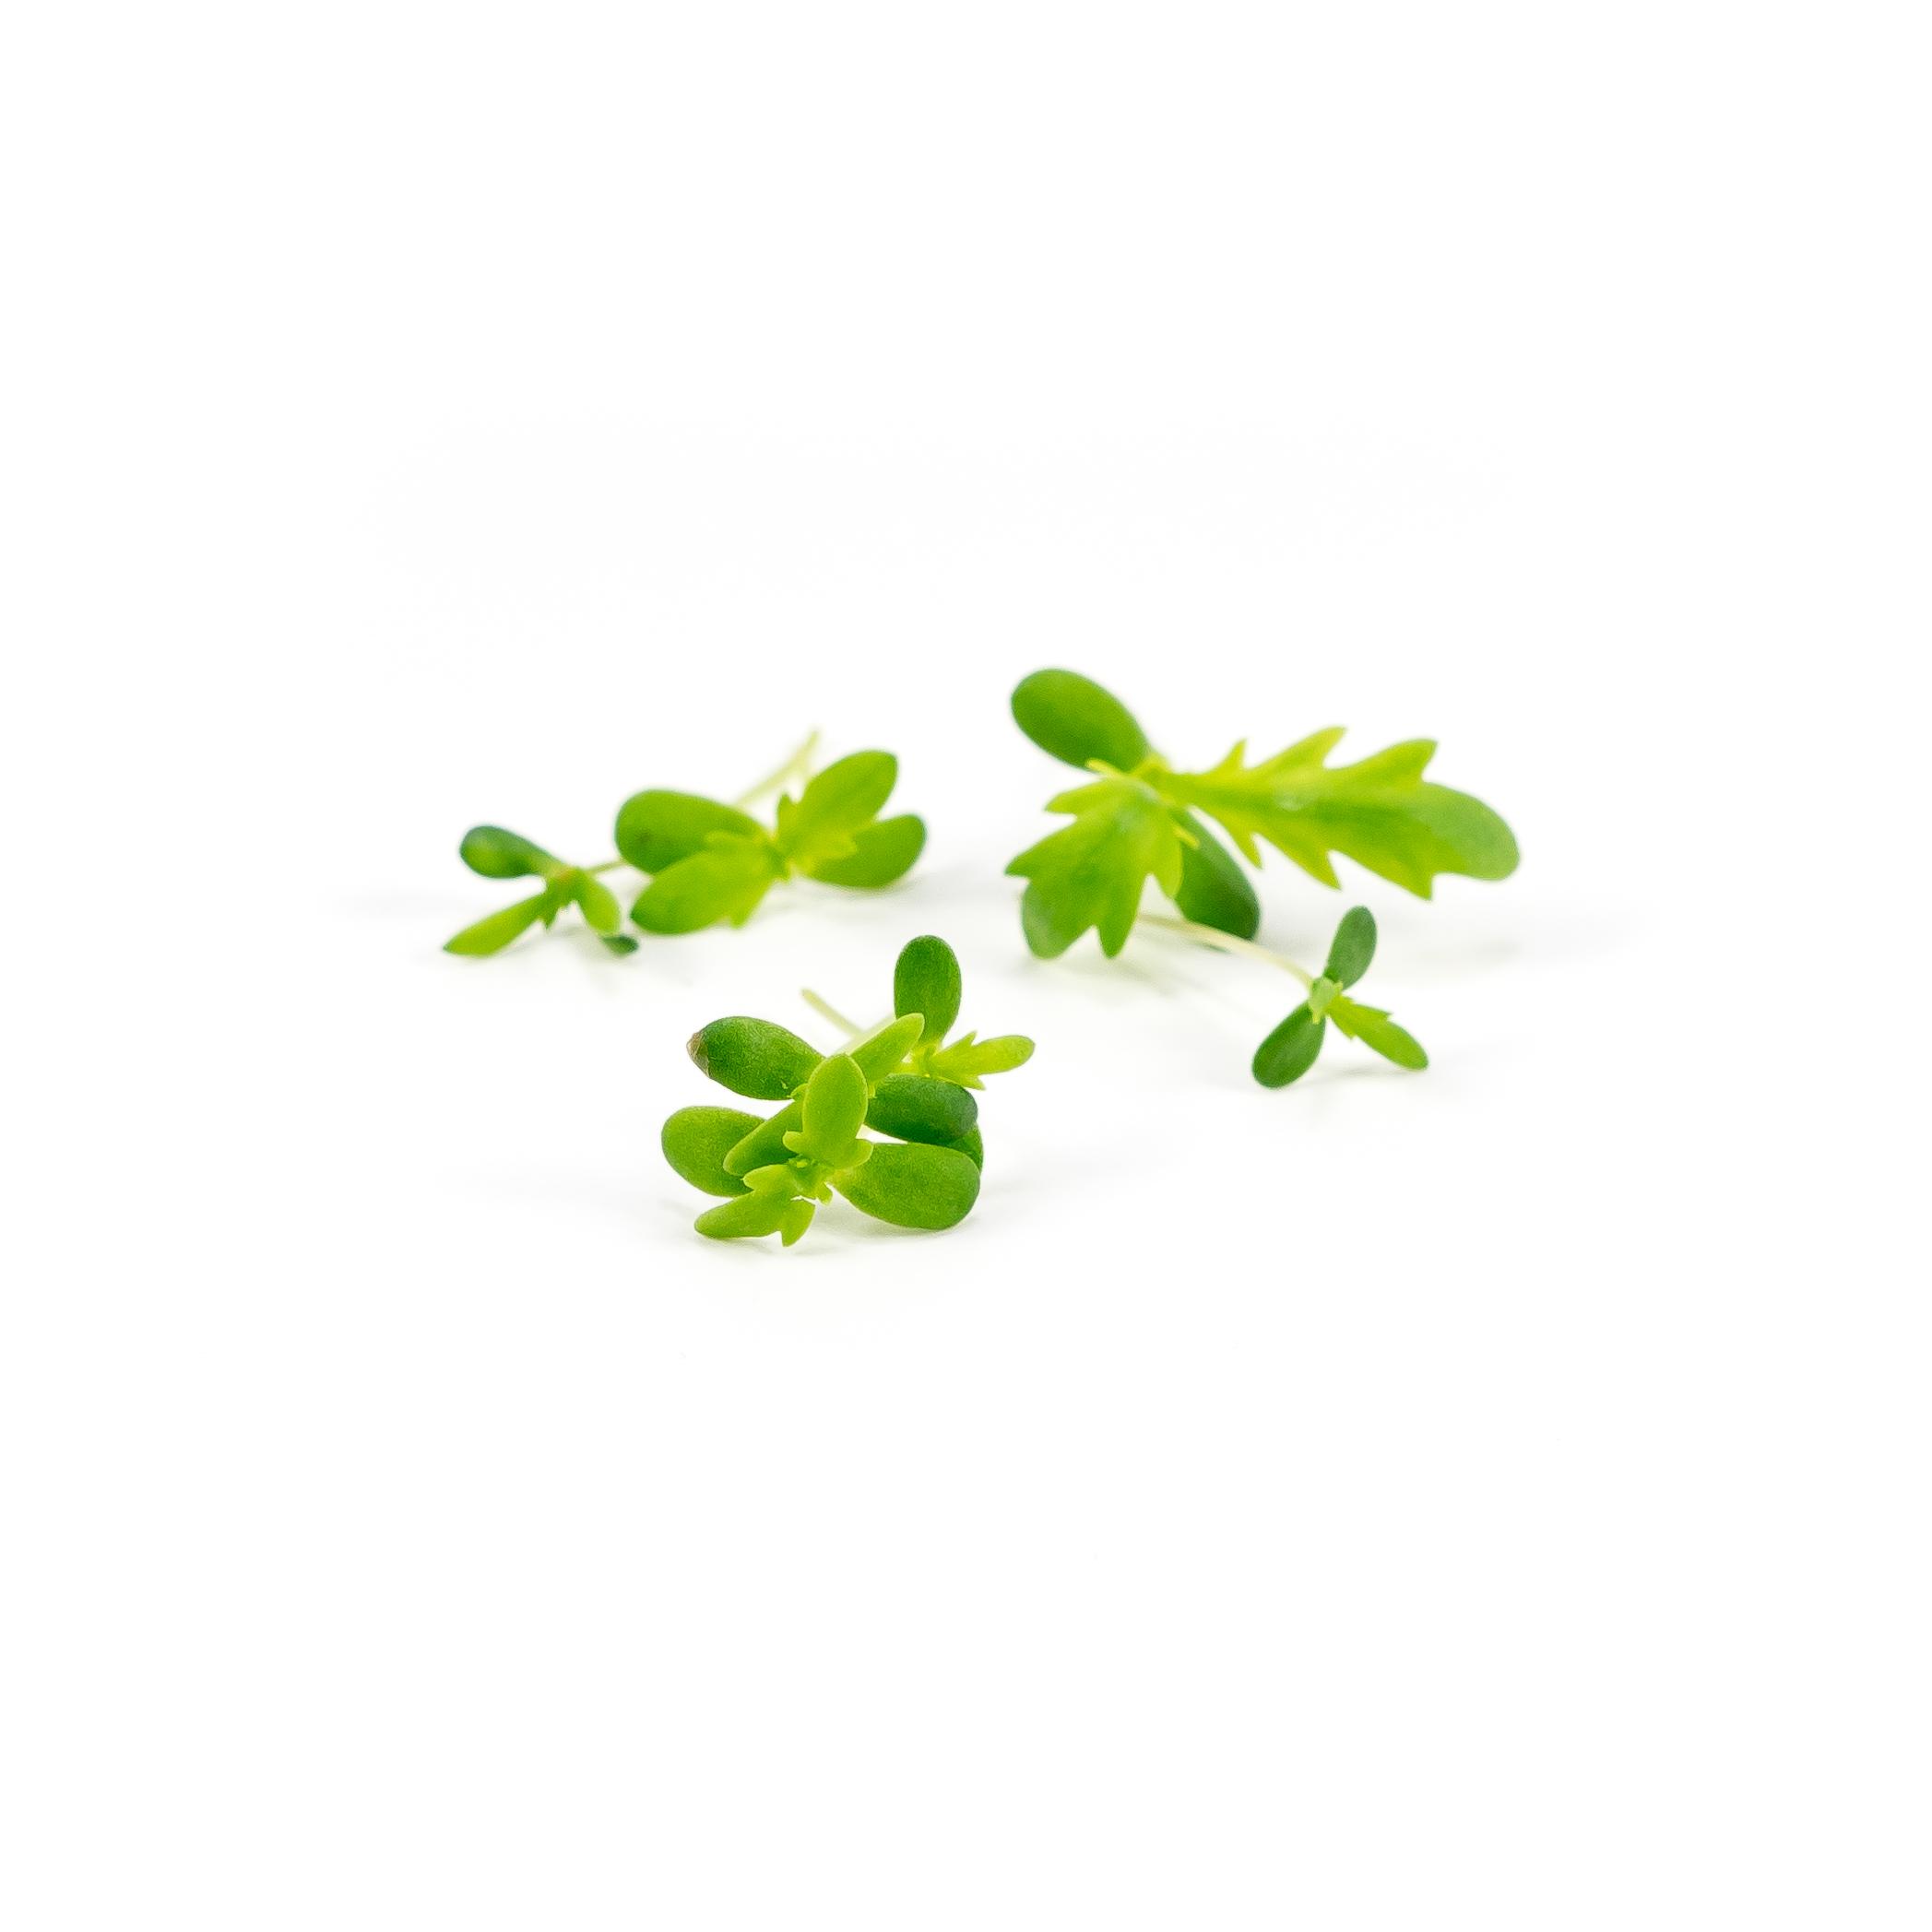 Serrated leaves with mild chrysanthemum flavor